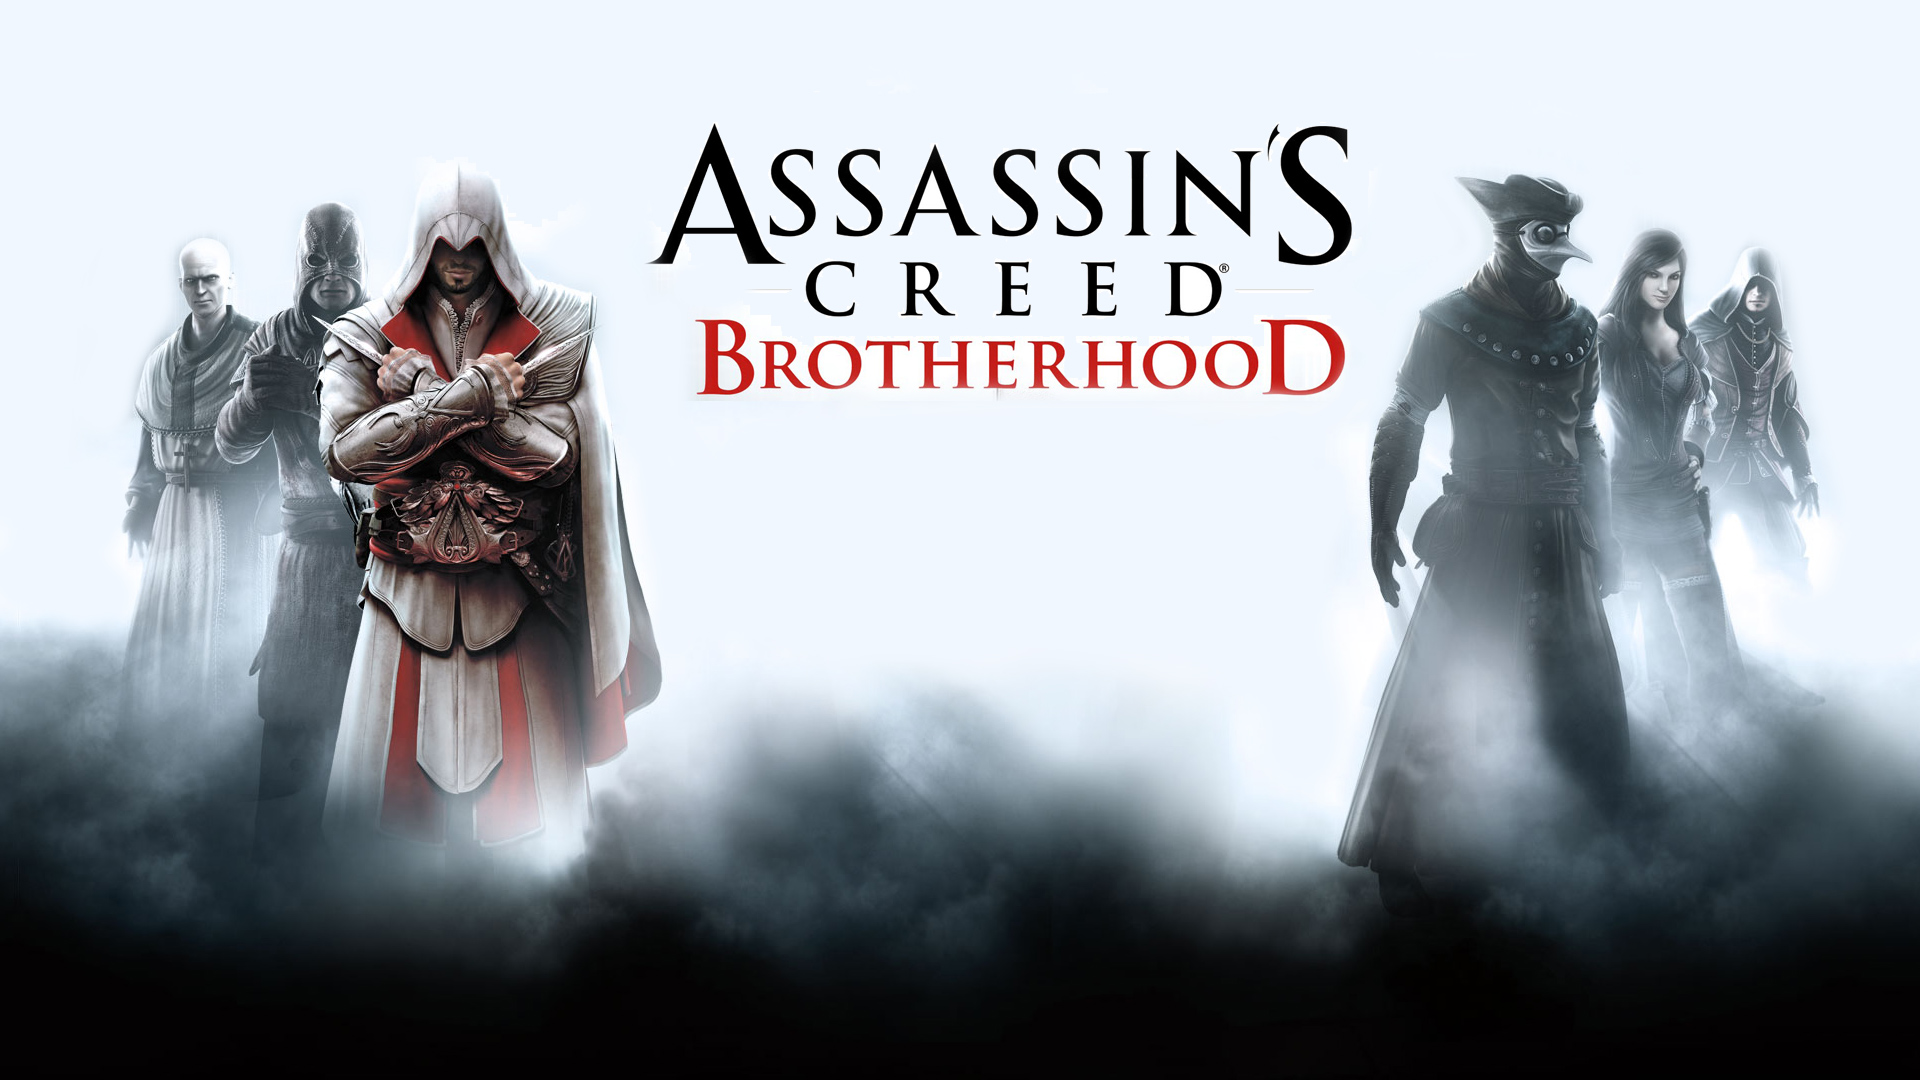 Assassins Creed Brotherhood 1080p Wallpapers HD Wallpapers 1920x1080